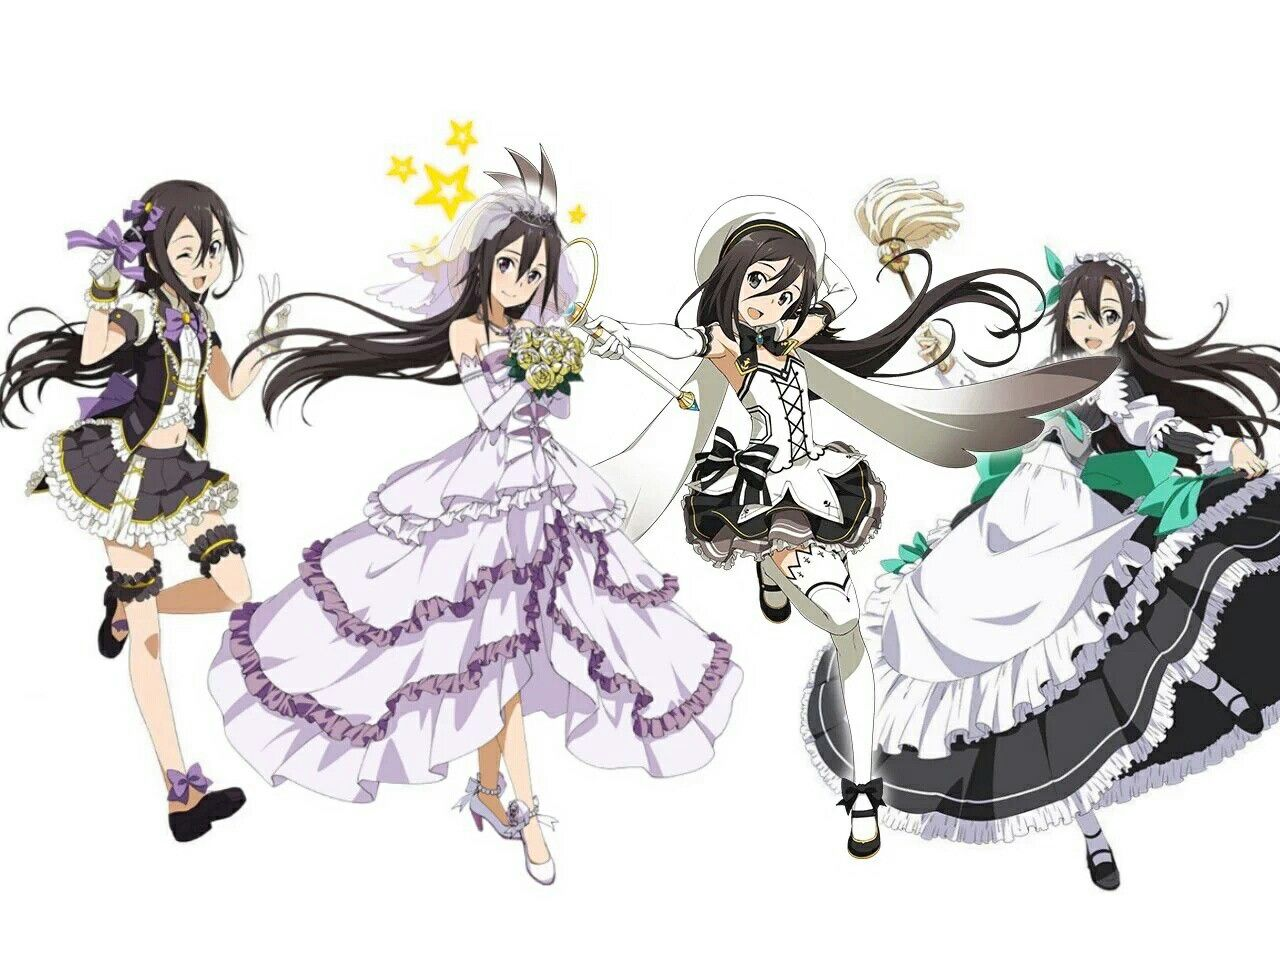 Dress up games favourites by asuna and kirito on deviantart - Kirito Sword Art Online